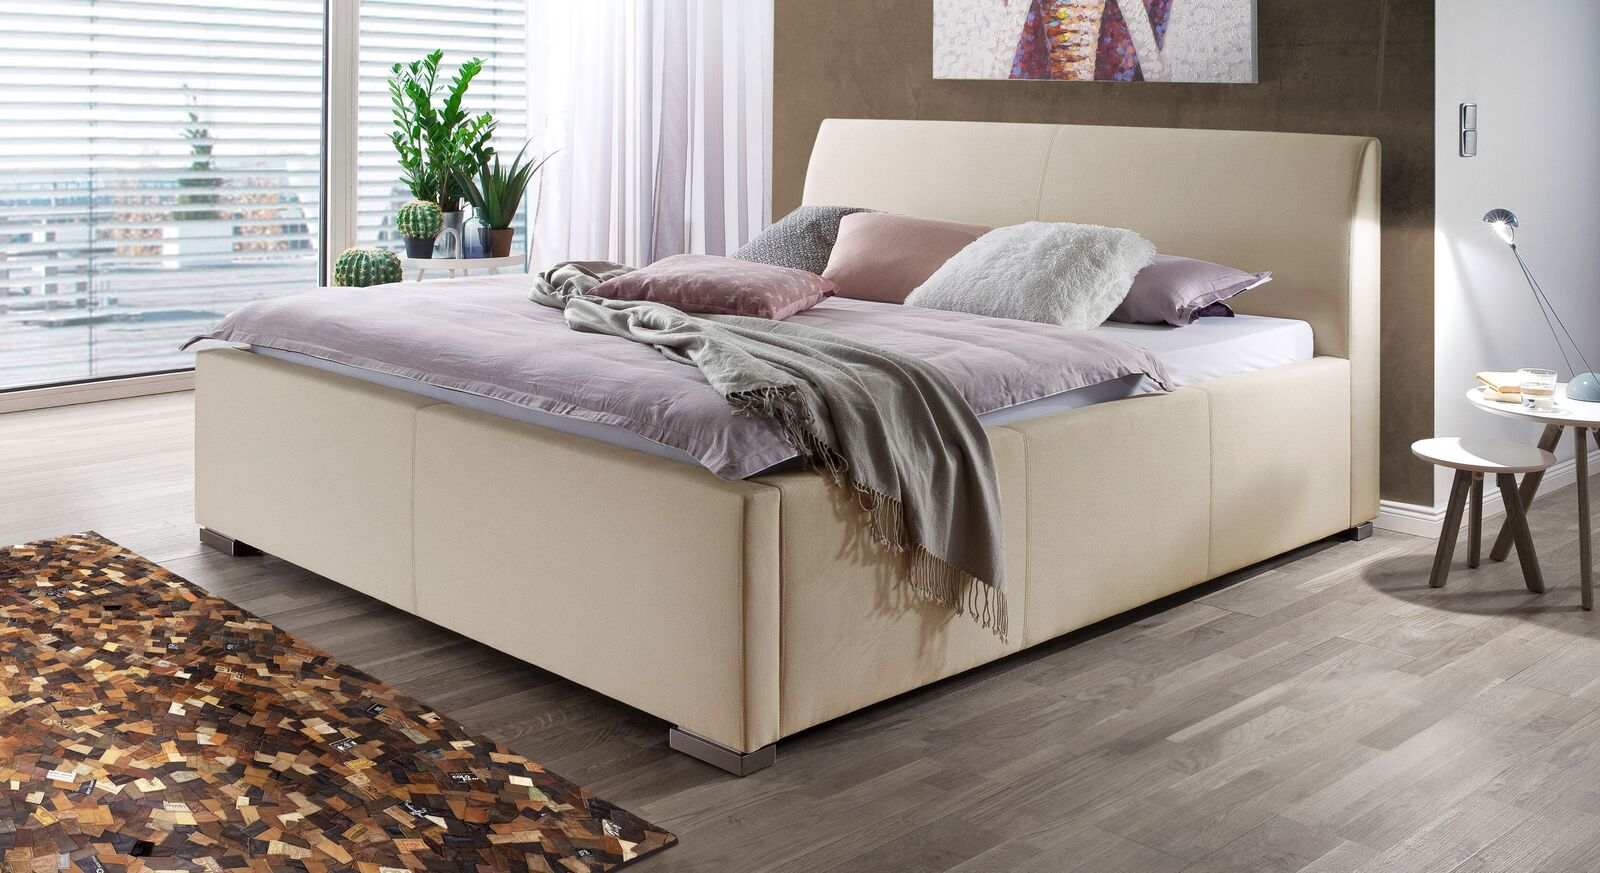 Bett Sesimbra mit beigefarbenem Stoffbezug